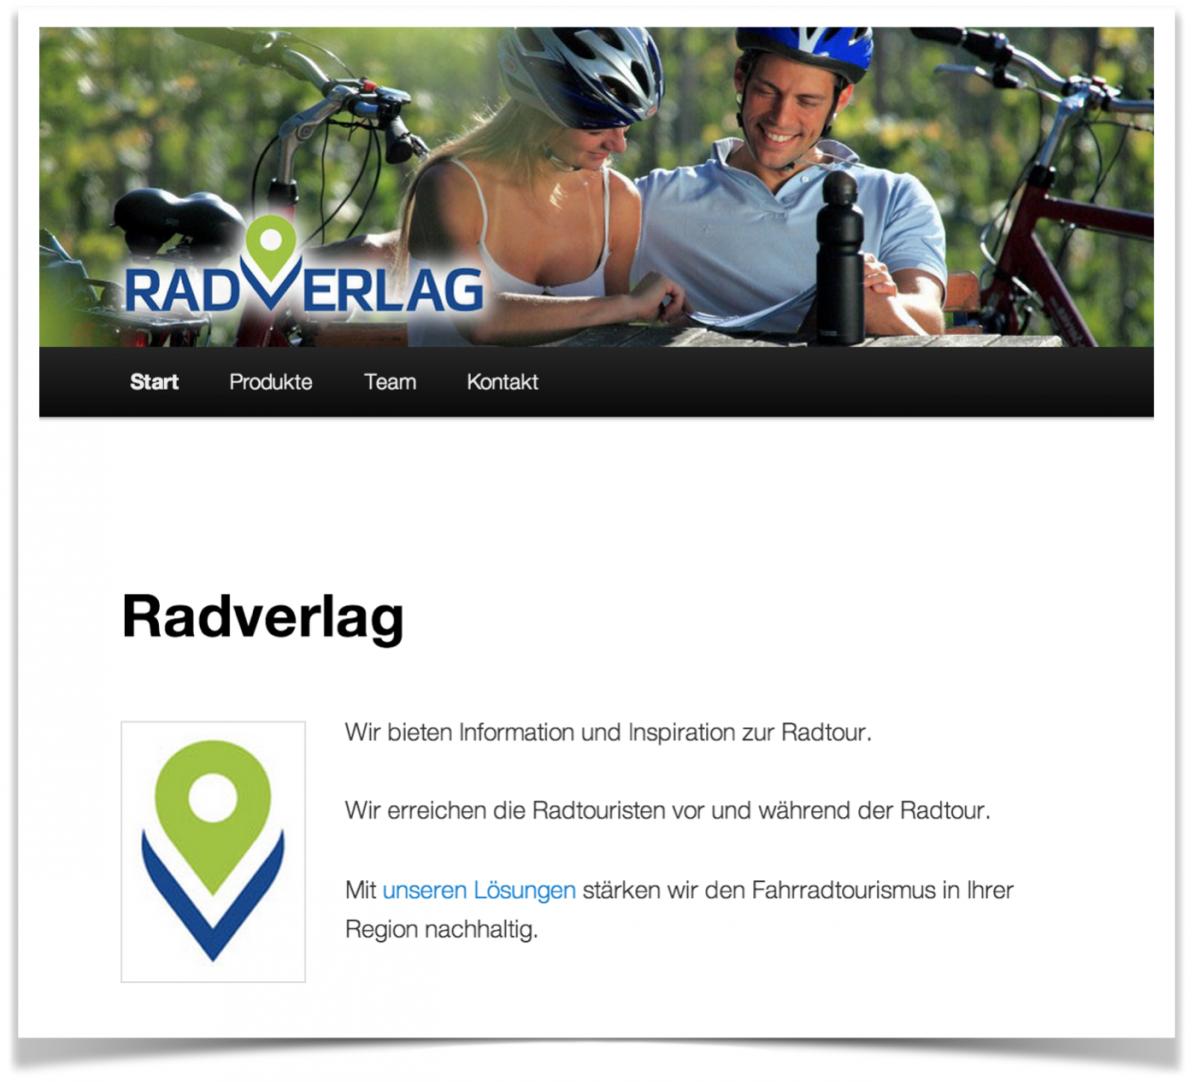 Radverlag